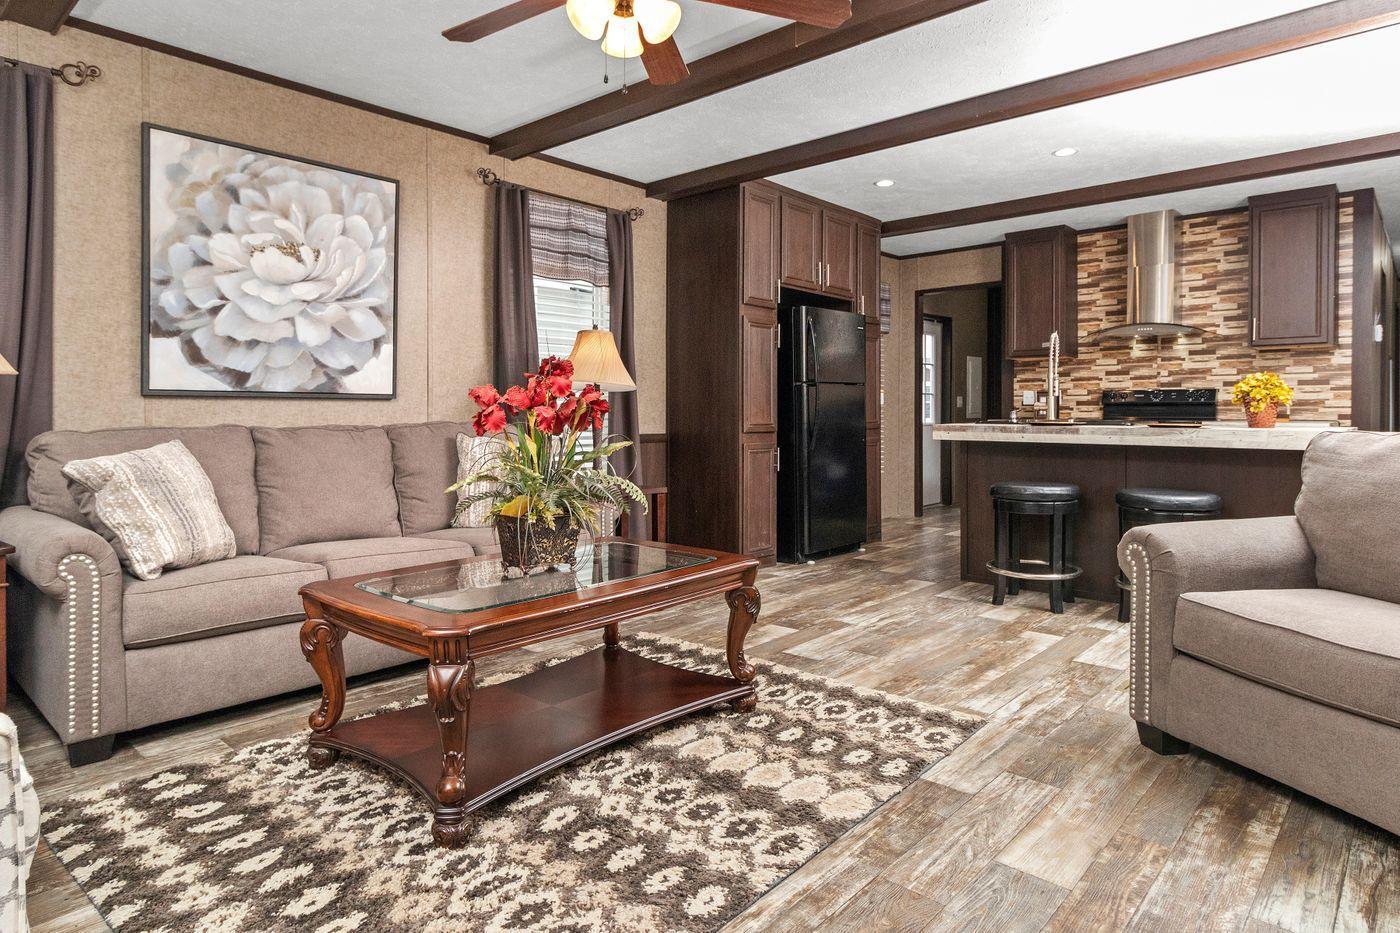 The Parkside Living Room